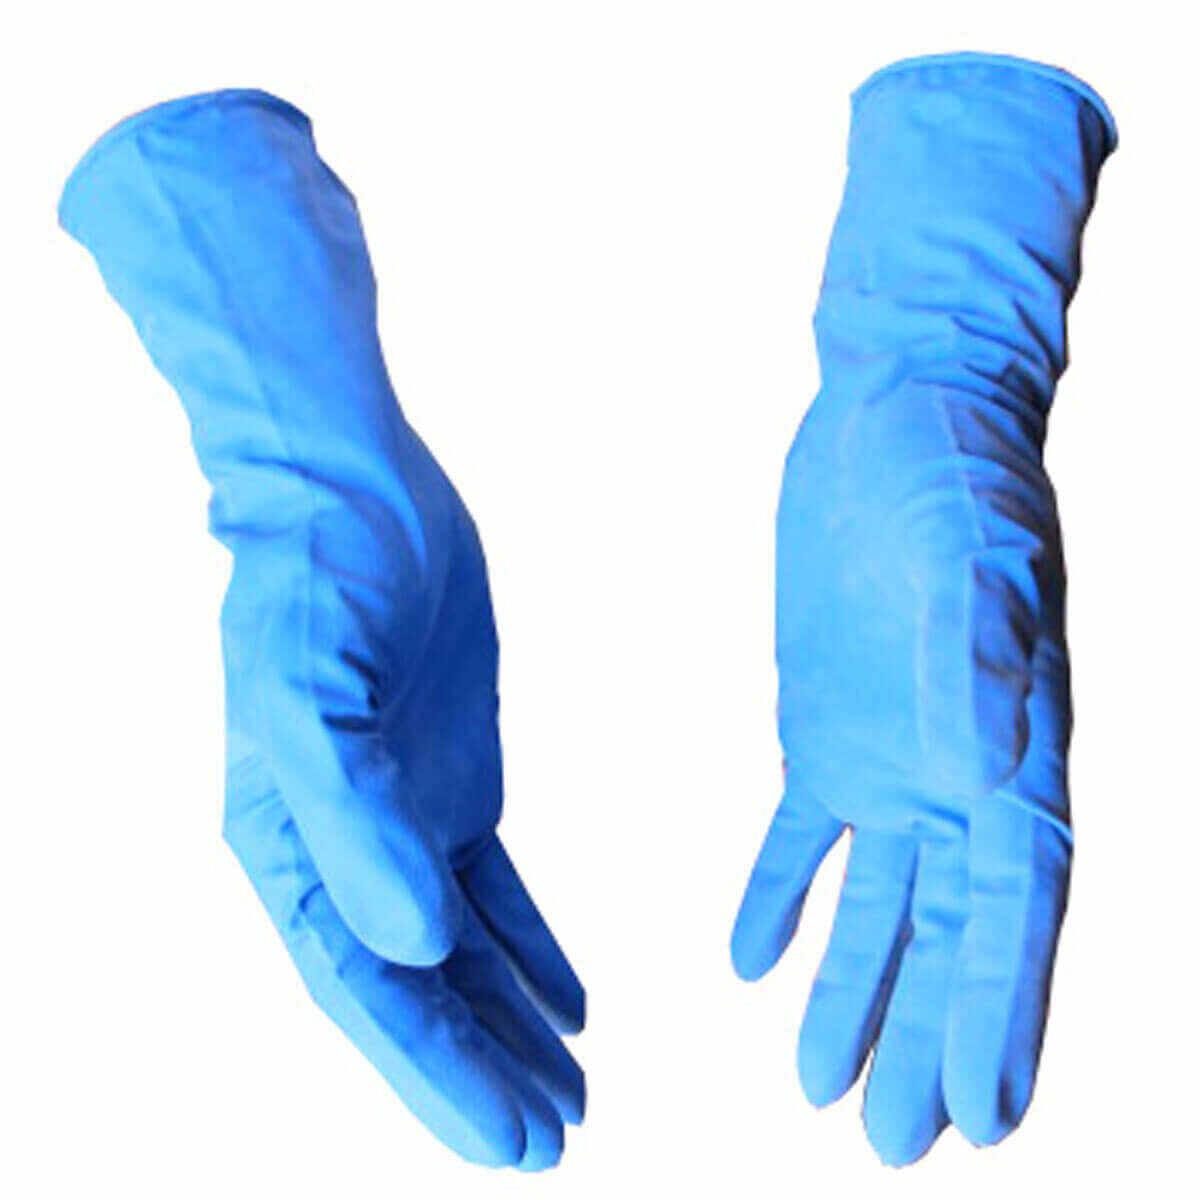 Troxell Heavy Duty Grouting Gloves